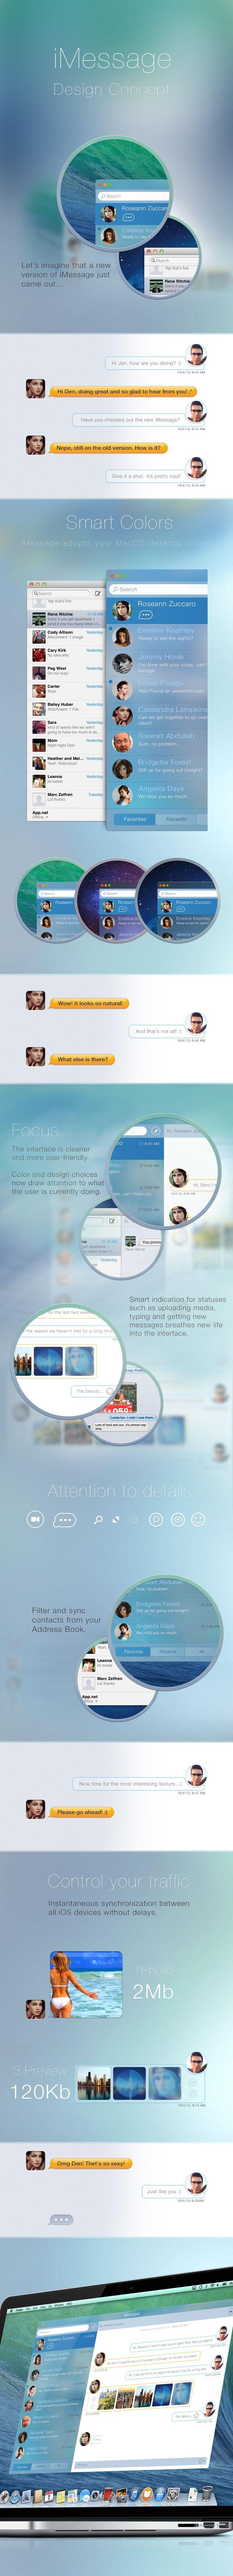 Dribbble social app ui design jpg by ramotion - Messages App Concept Interface Ui Ux Gui App Flatdesign